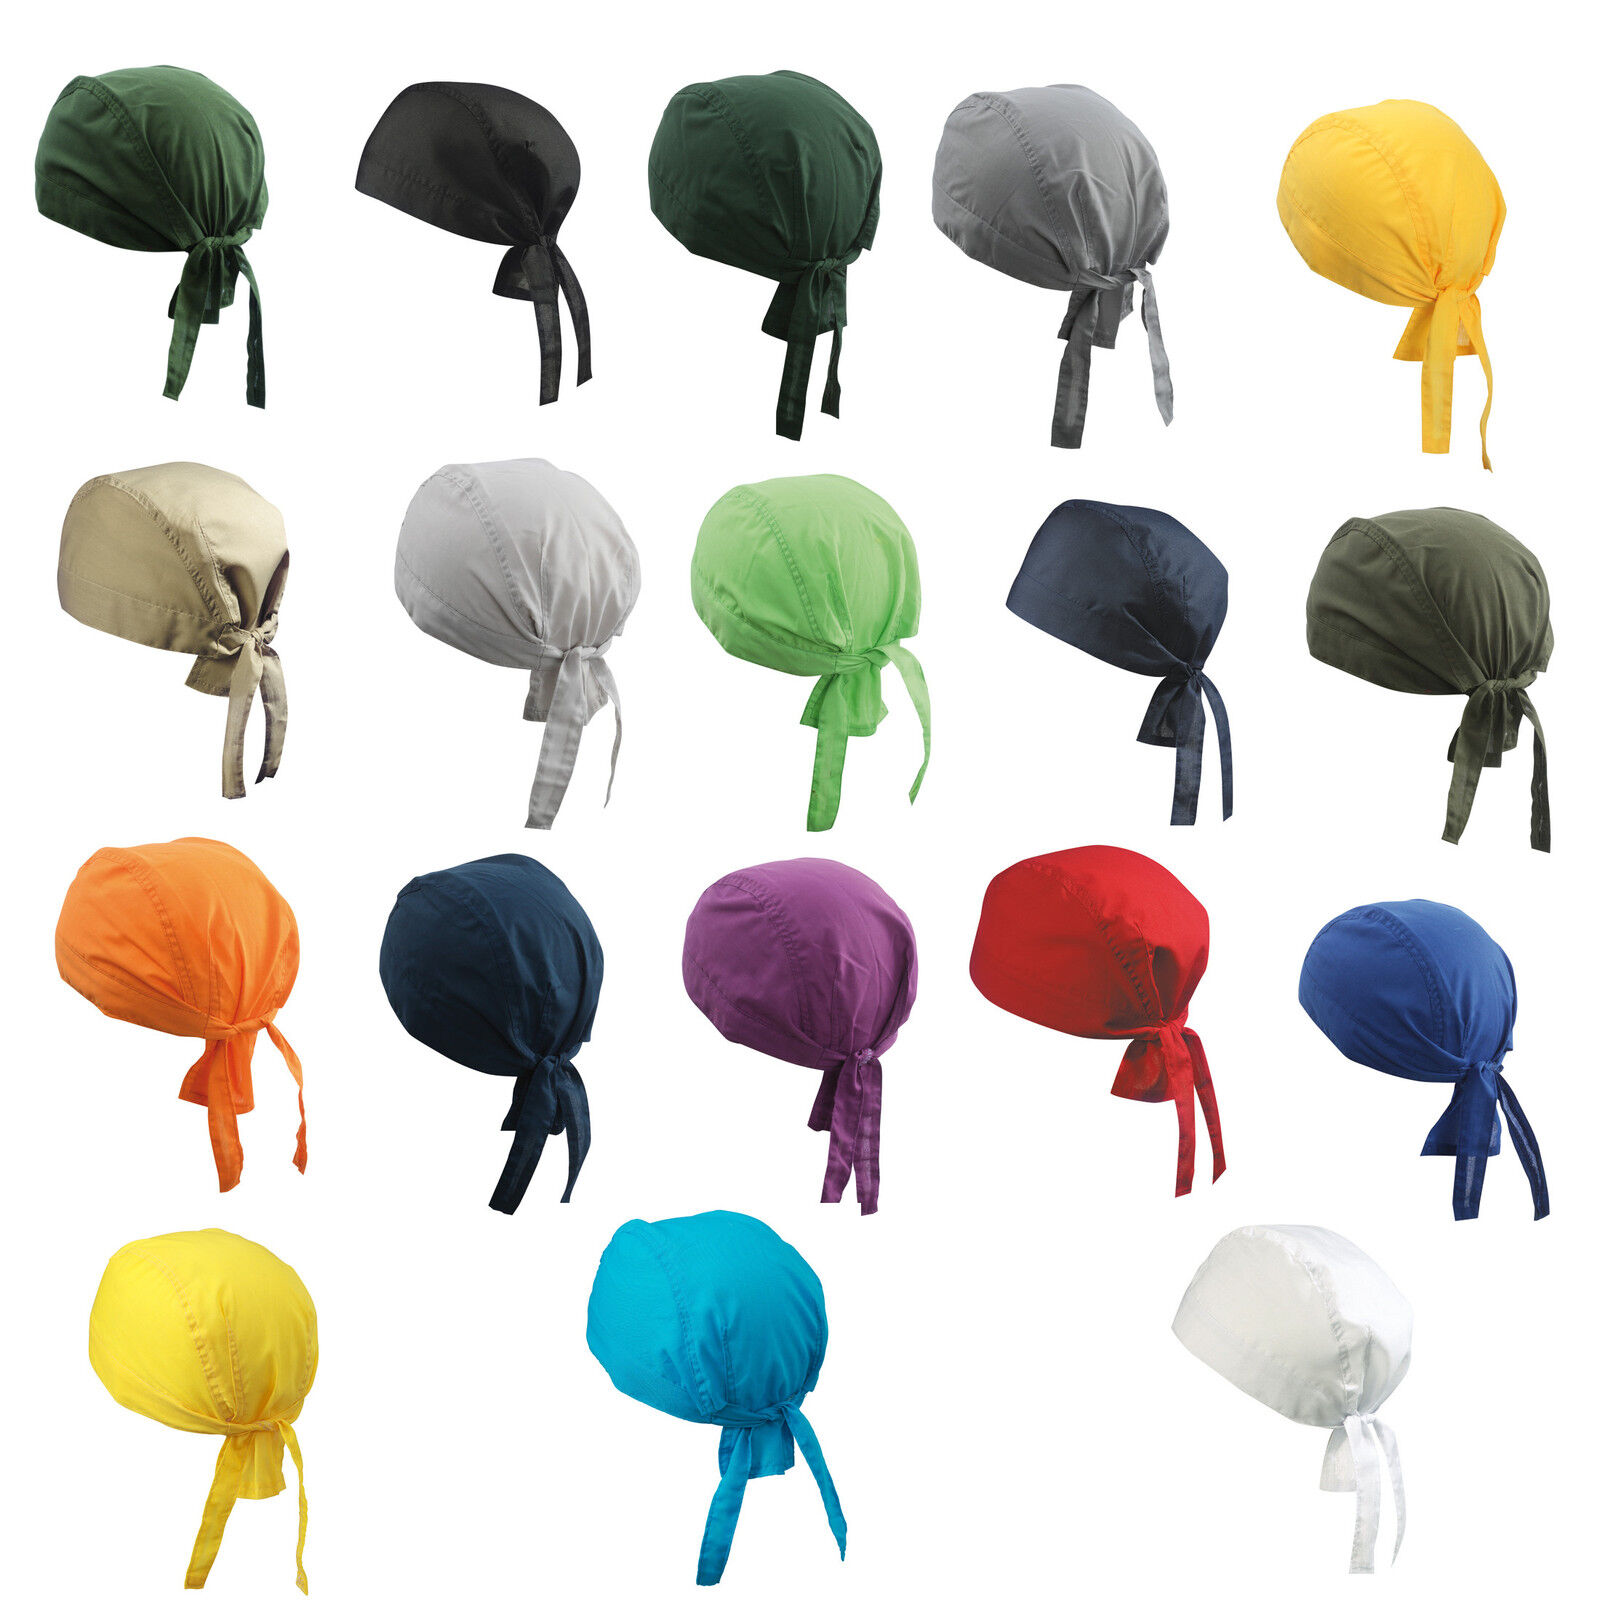 Bandana Hut Mütze Hat Kochbekleidung Kochen Kopftuch viele Farben